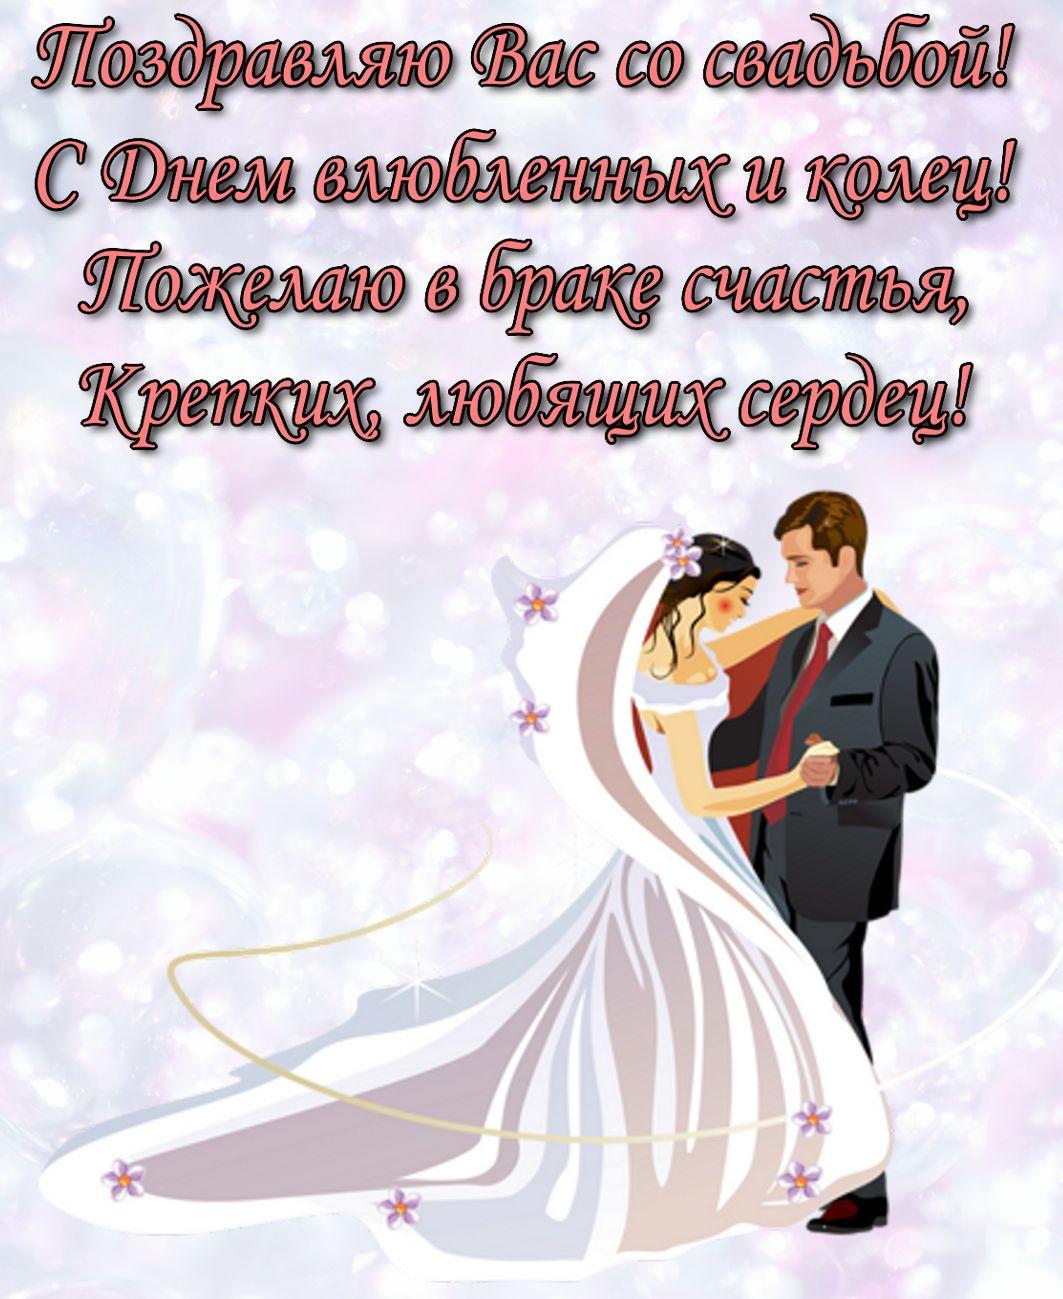 также поздравить коротко с днем свадьбы слову, сама